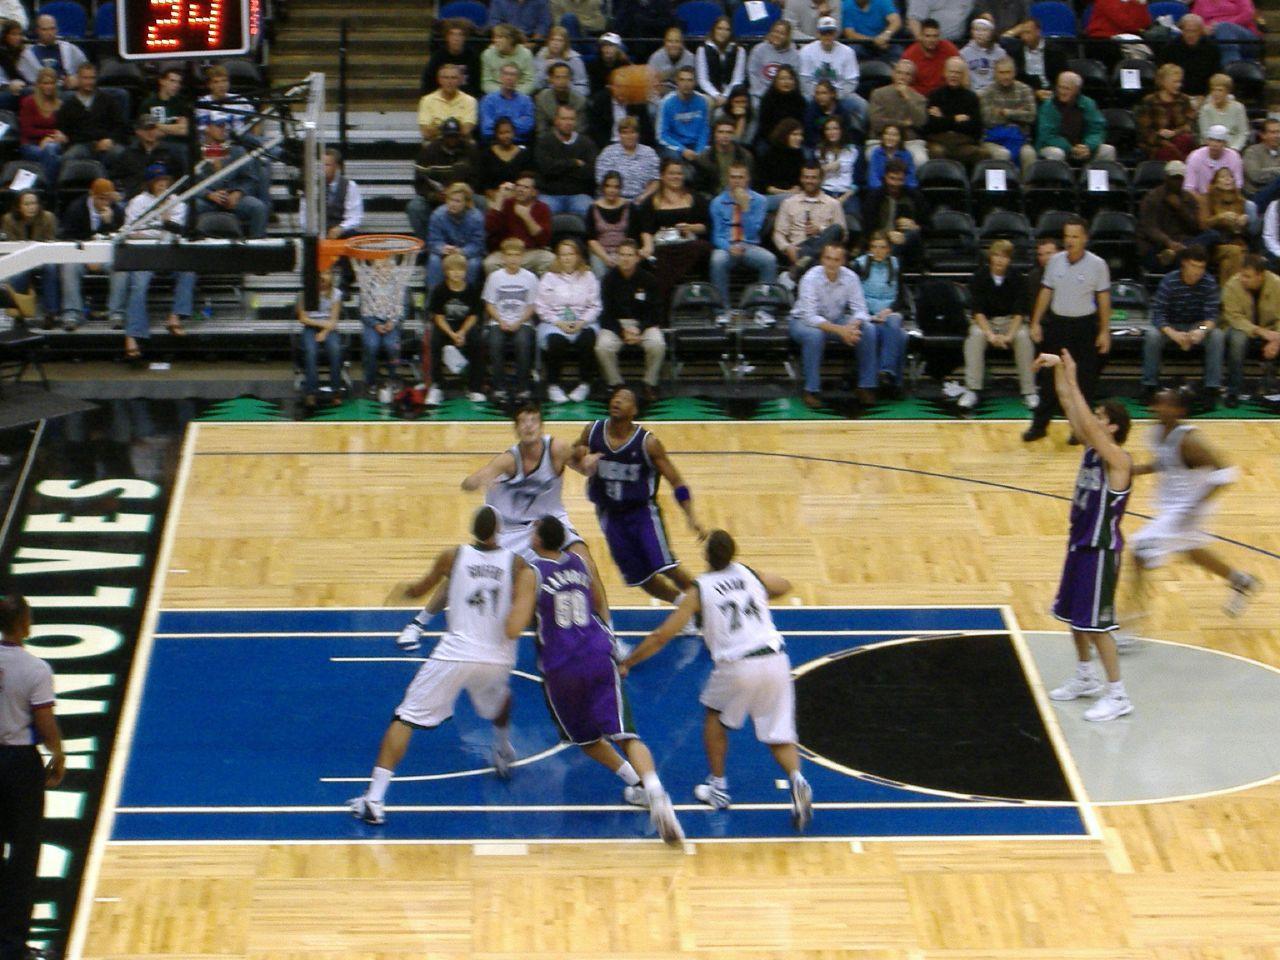 Minnesota Timberwolves play the Milwaukee Bucks